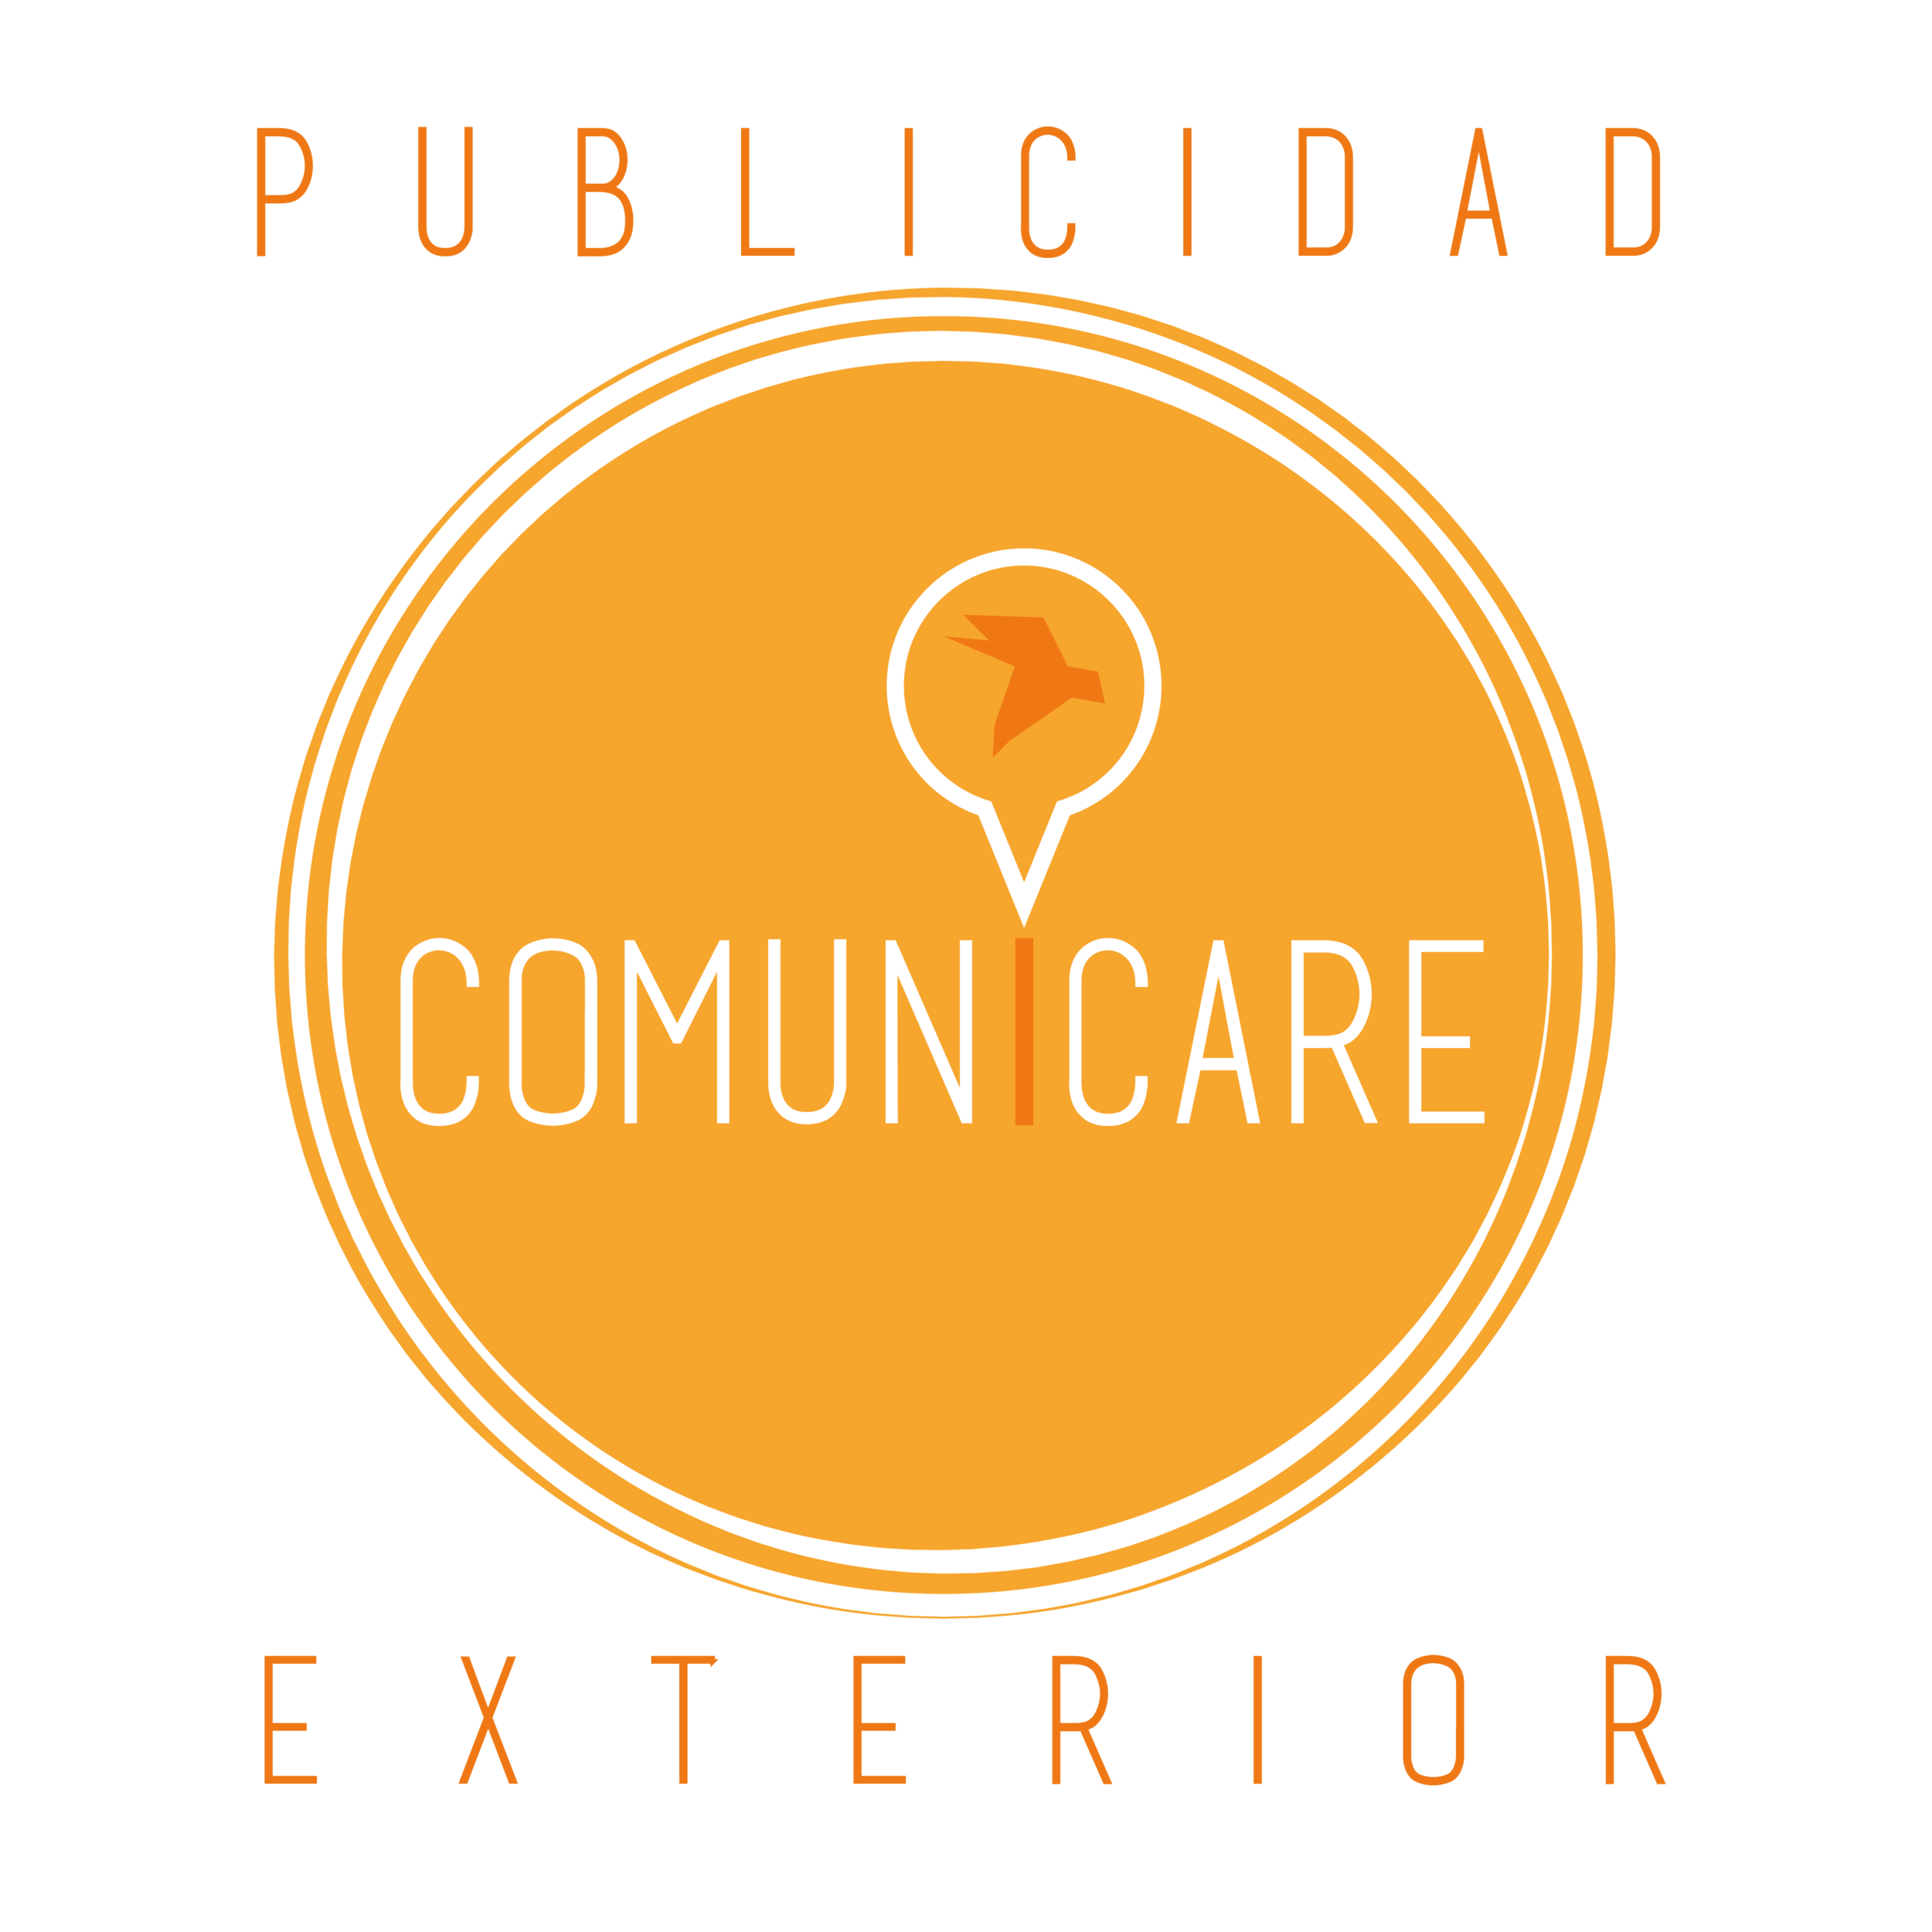 Comunicare, publicidad exterior, toluca, mexico, web bakers